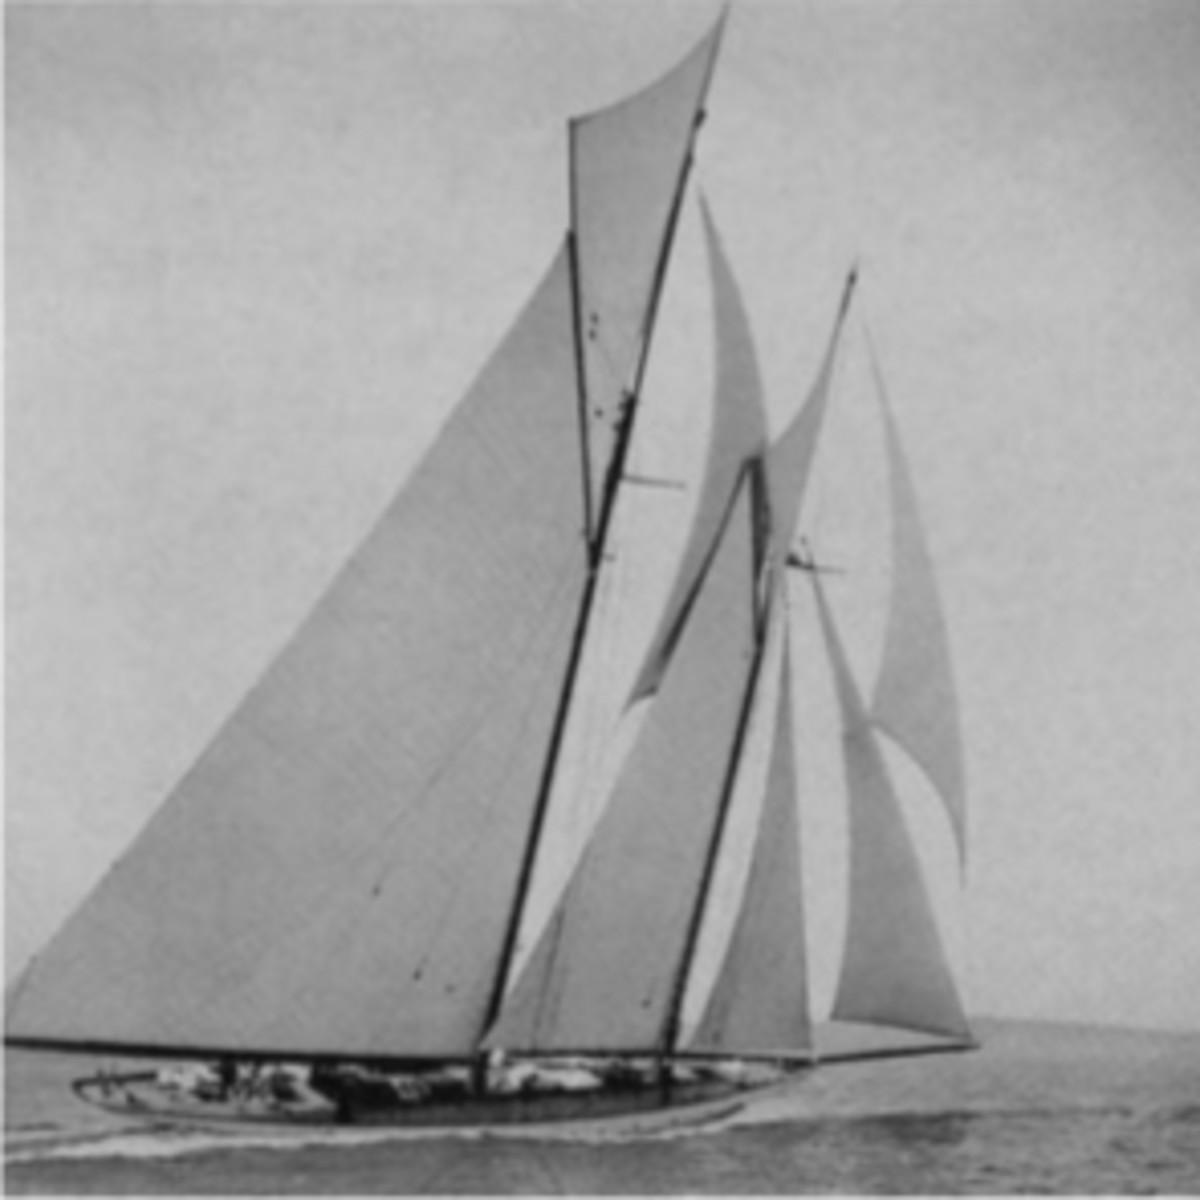 Ingomarwon every yacht club race in her first season.